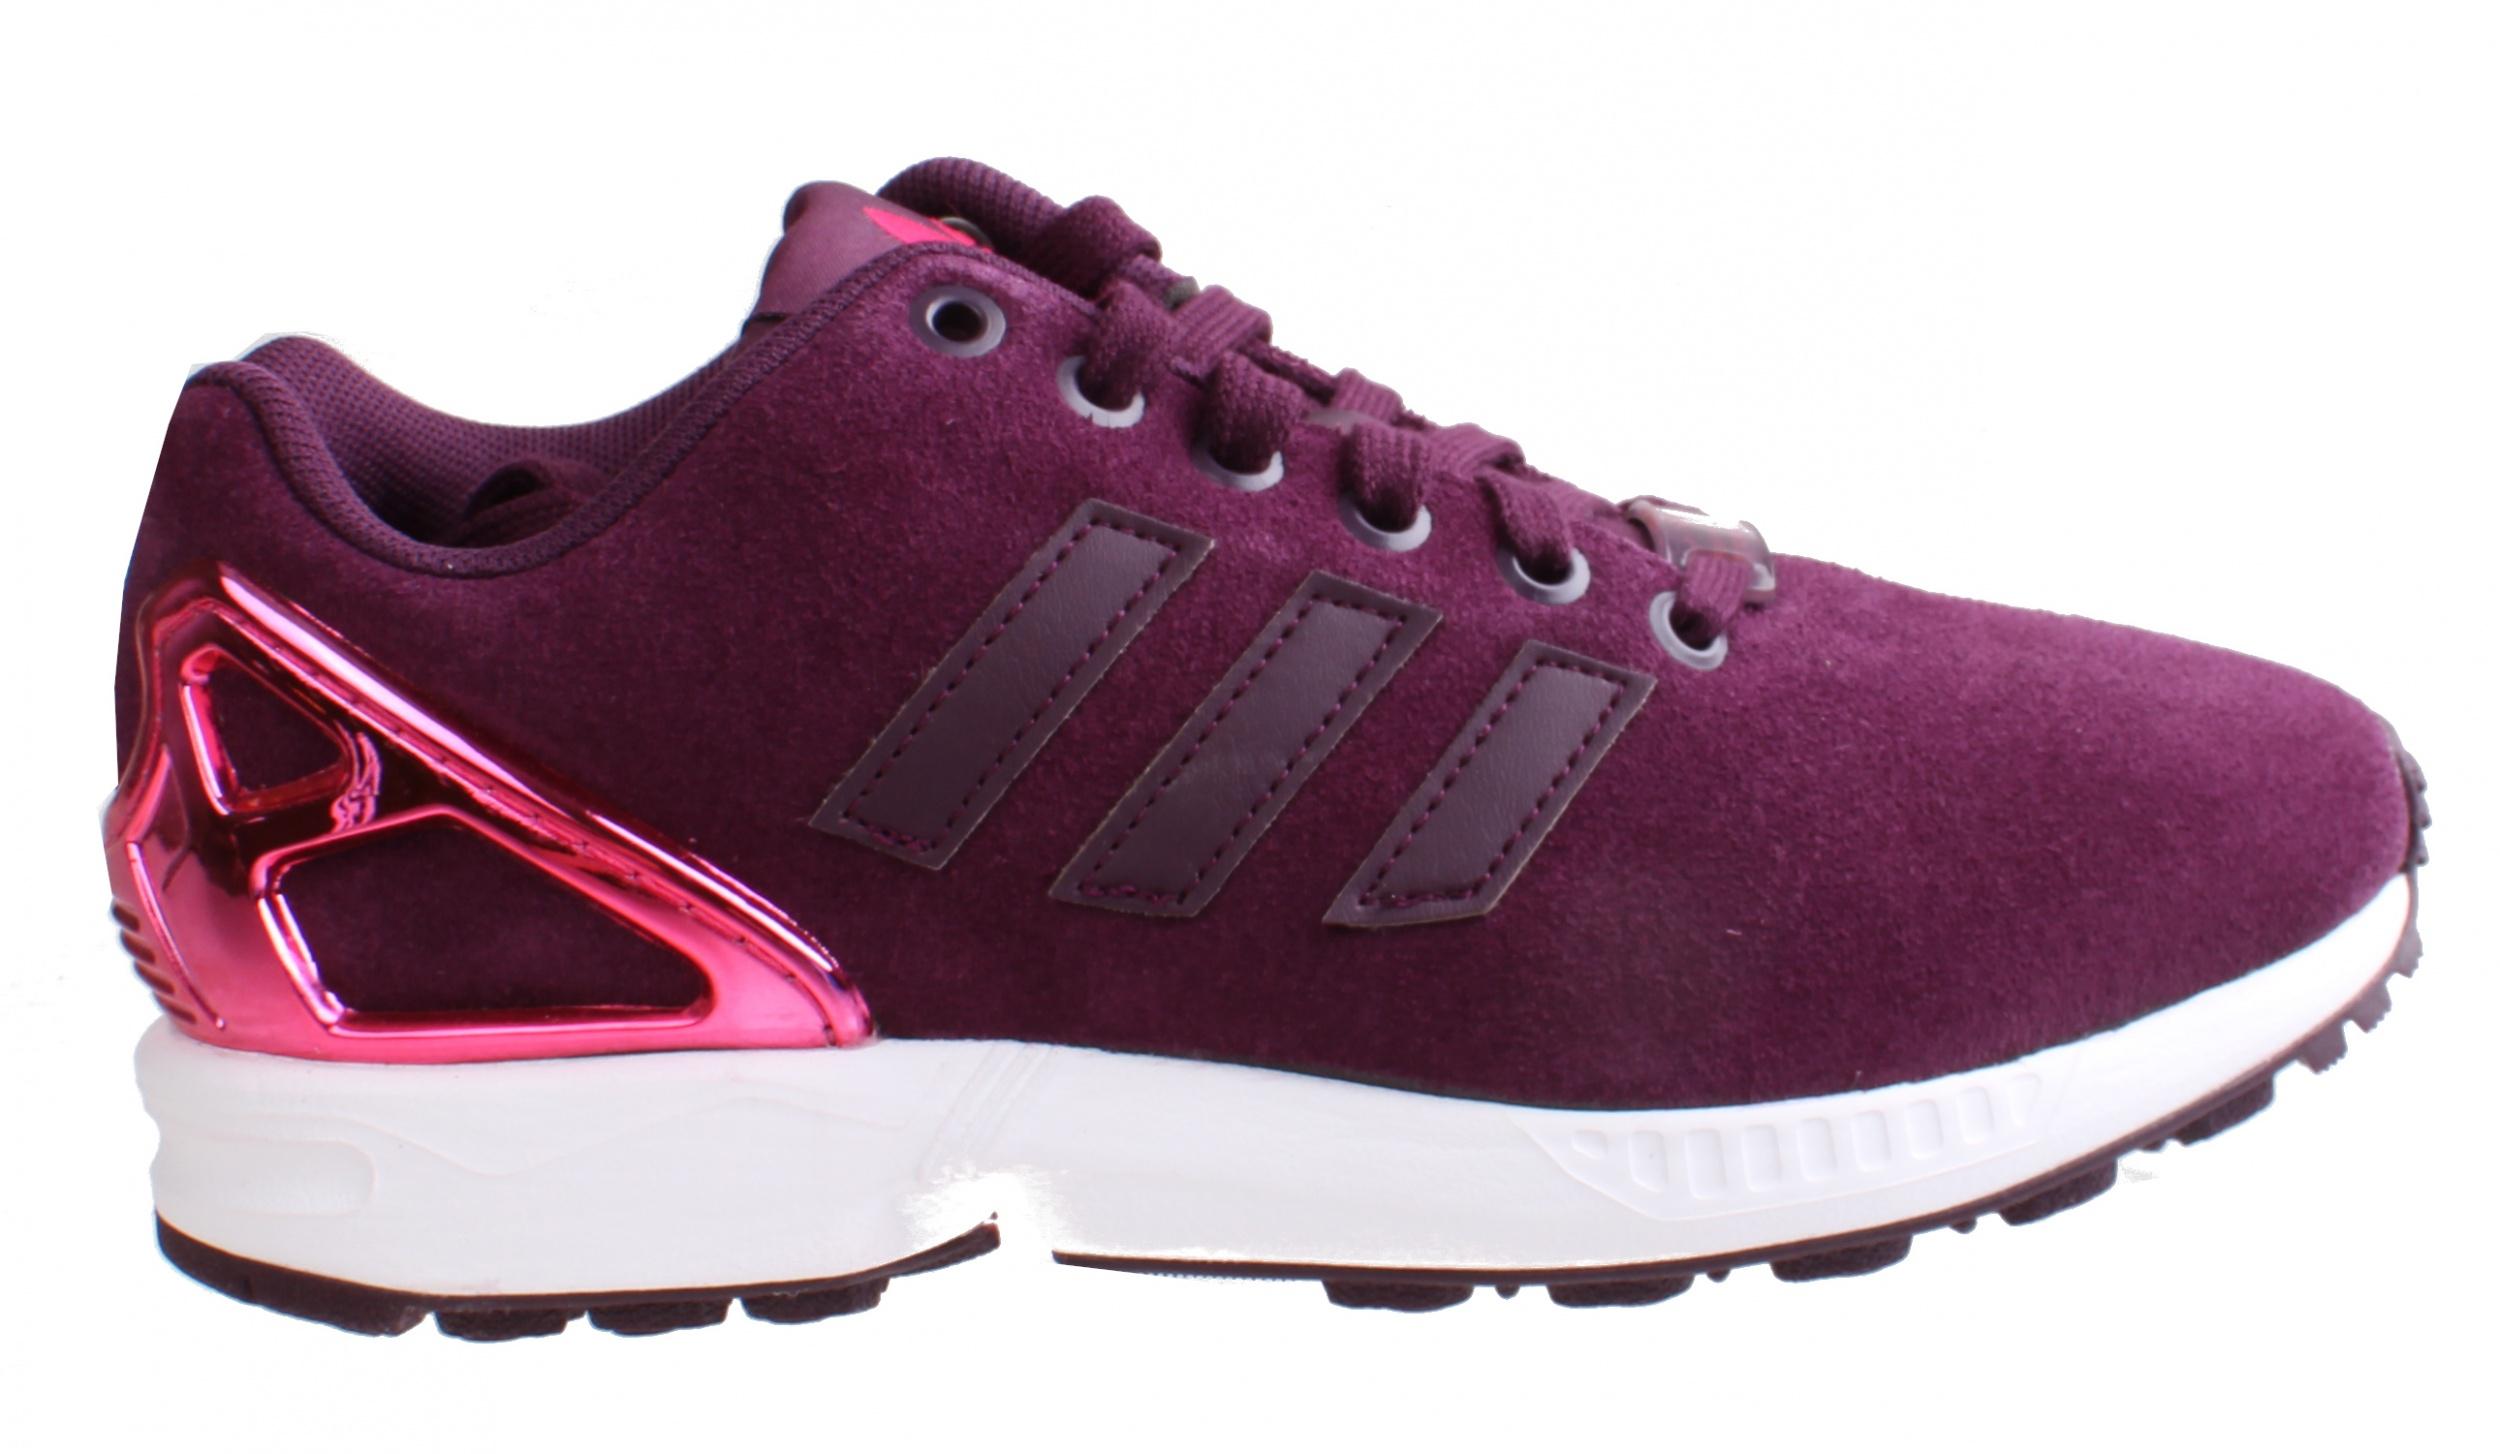 Sneakers Zx Paars Flux Sport Adidas amp;casuals Dames Originals Internet UTEXqd